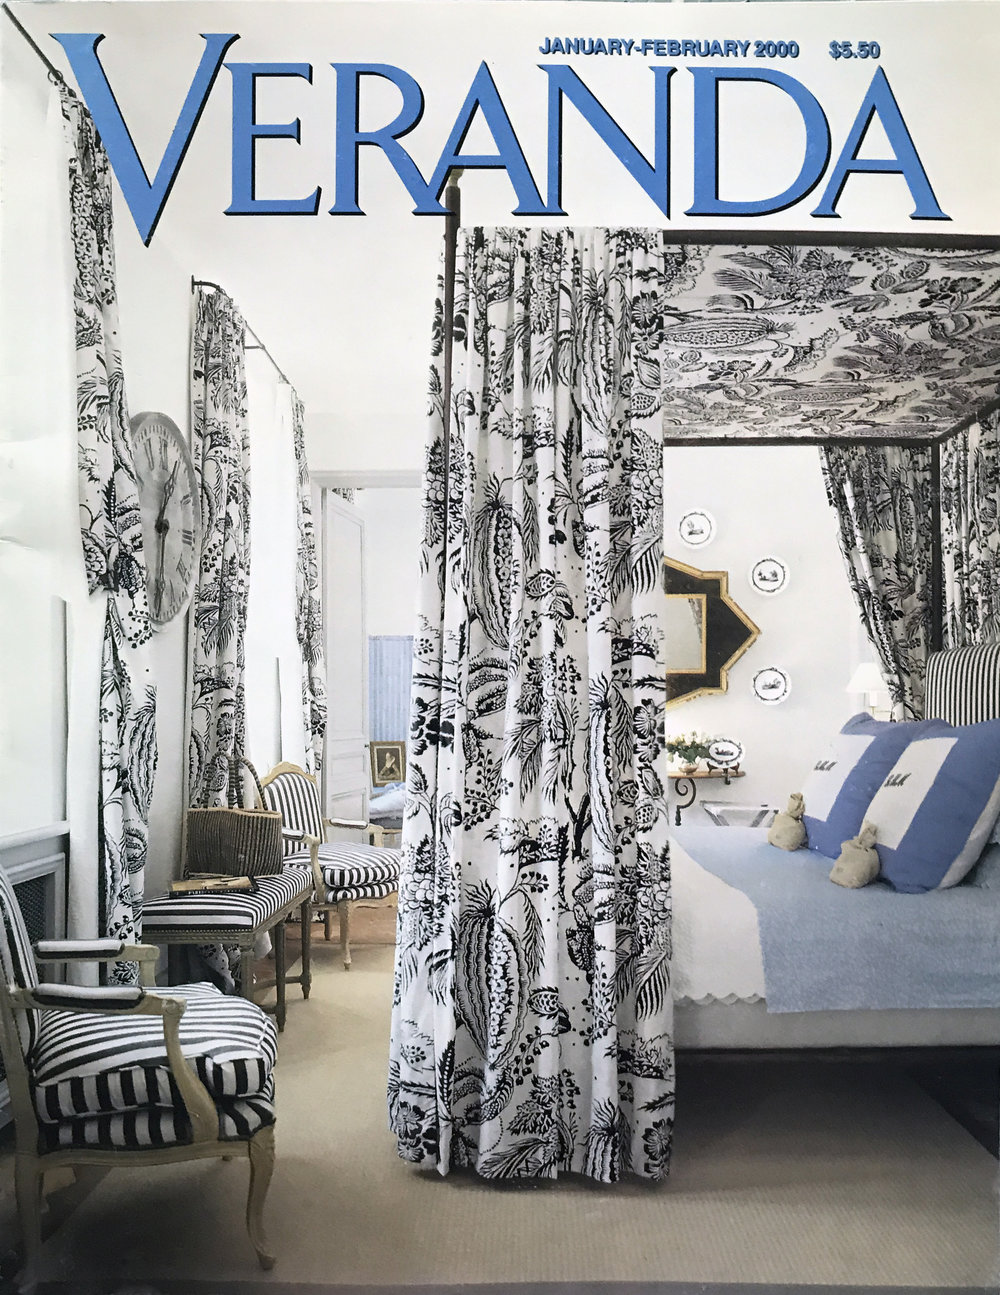 Ginny-Magher-Veranda-Mas-de-Baraquet-Bedrooms-2000.jpg